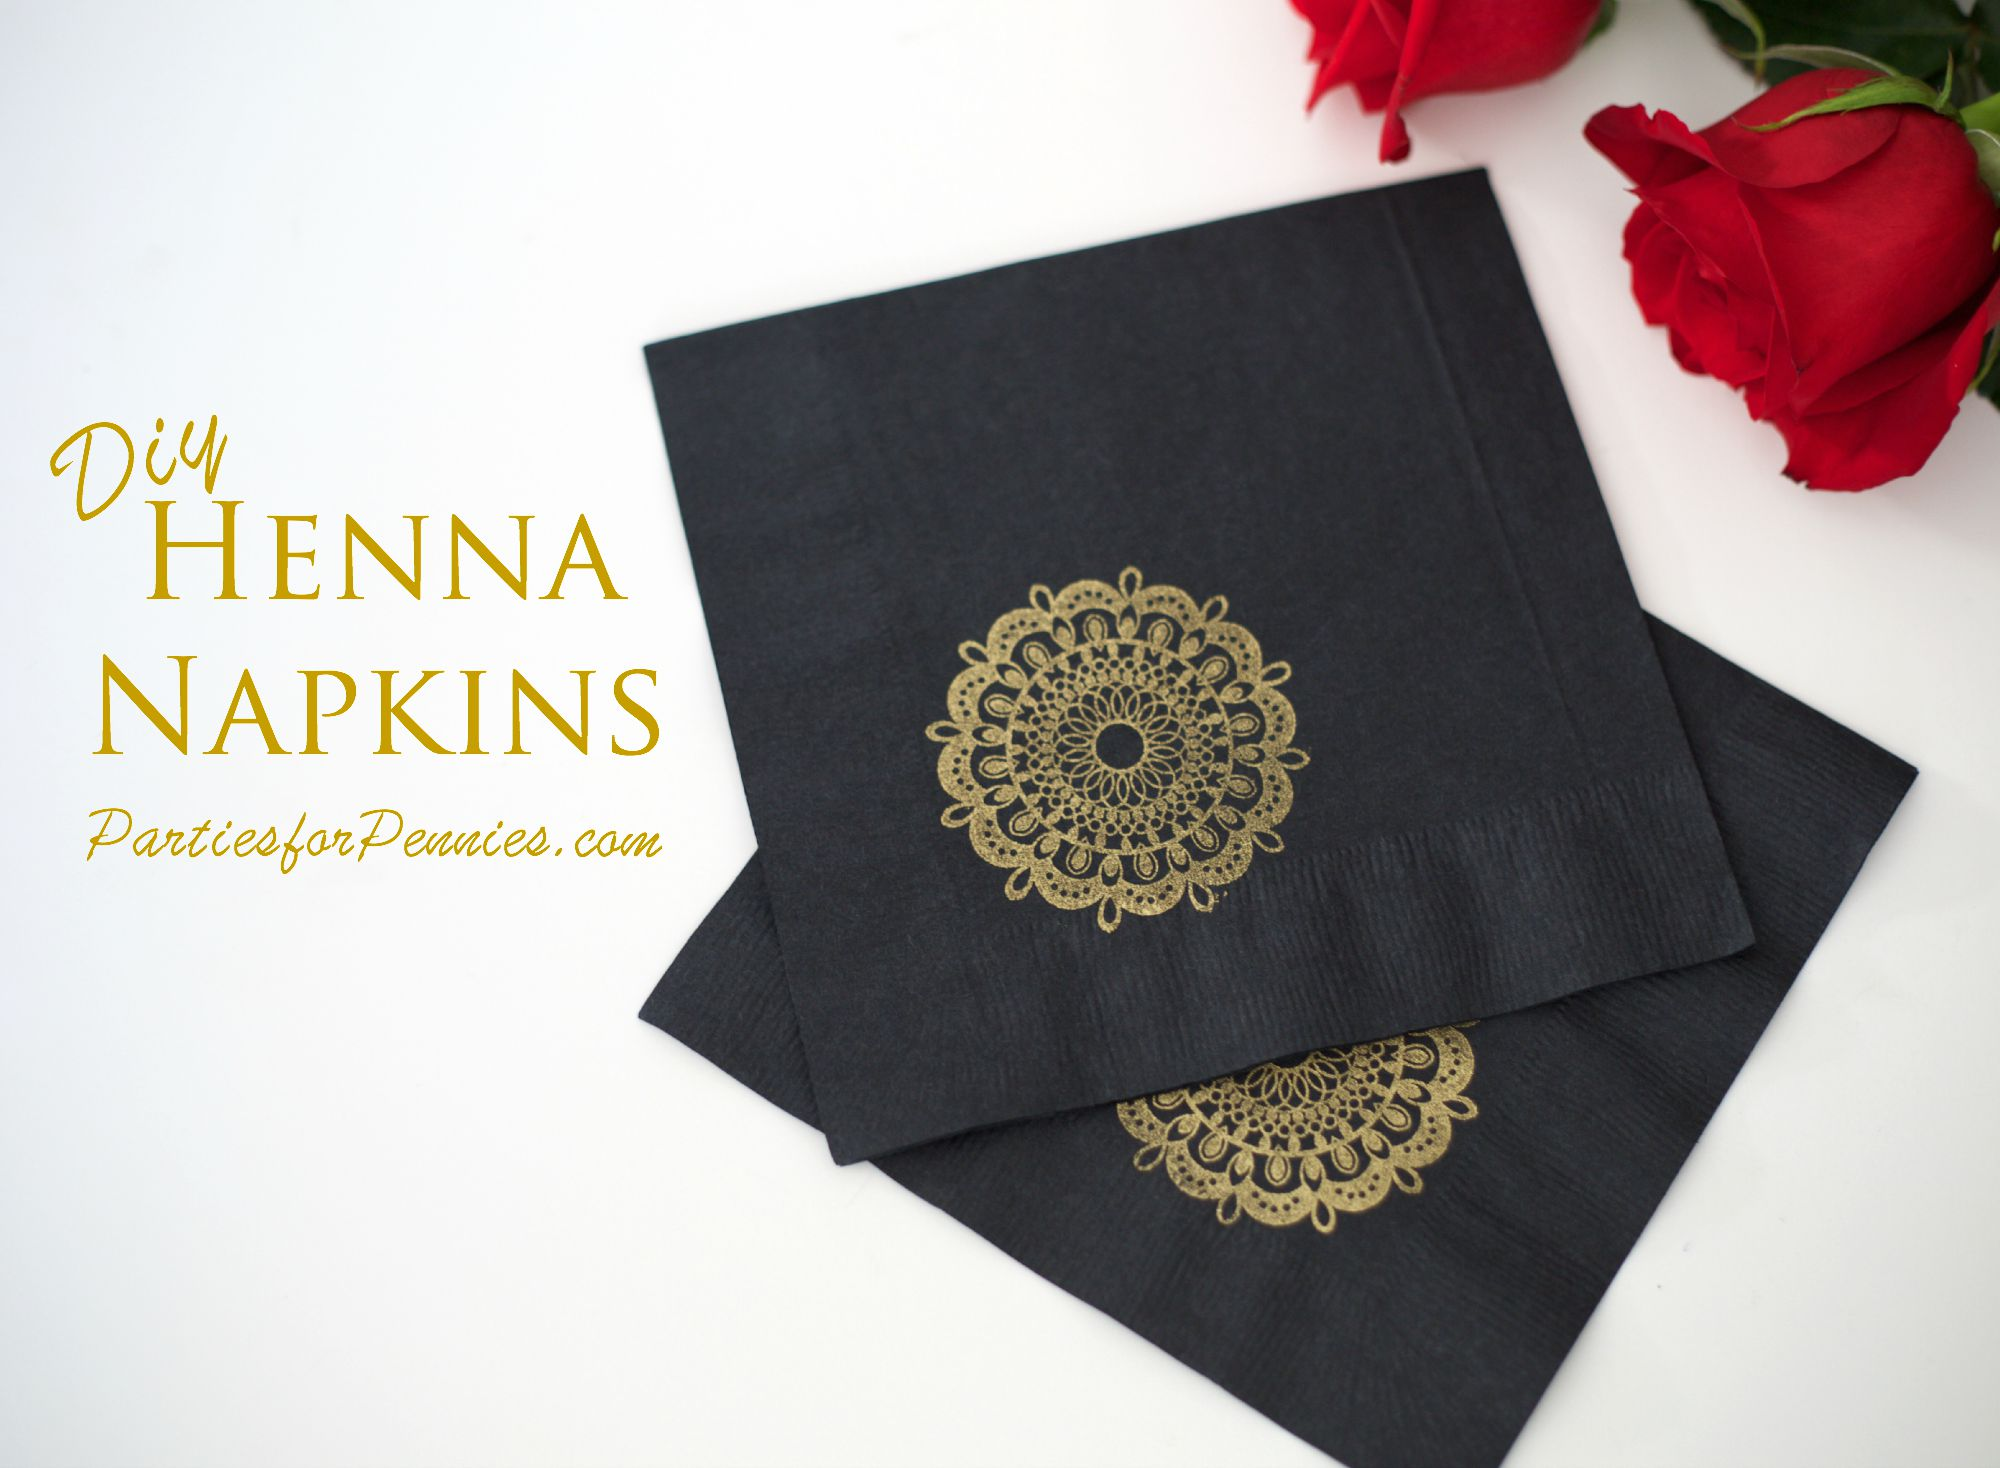 Diy Napkins | Personalized Napkins | Indian Wedding | Henna Napkins | #diy #napkins #partysupplies